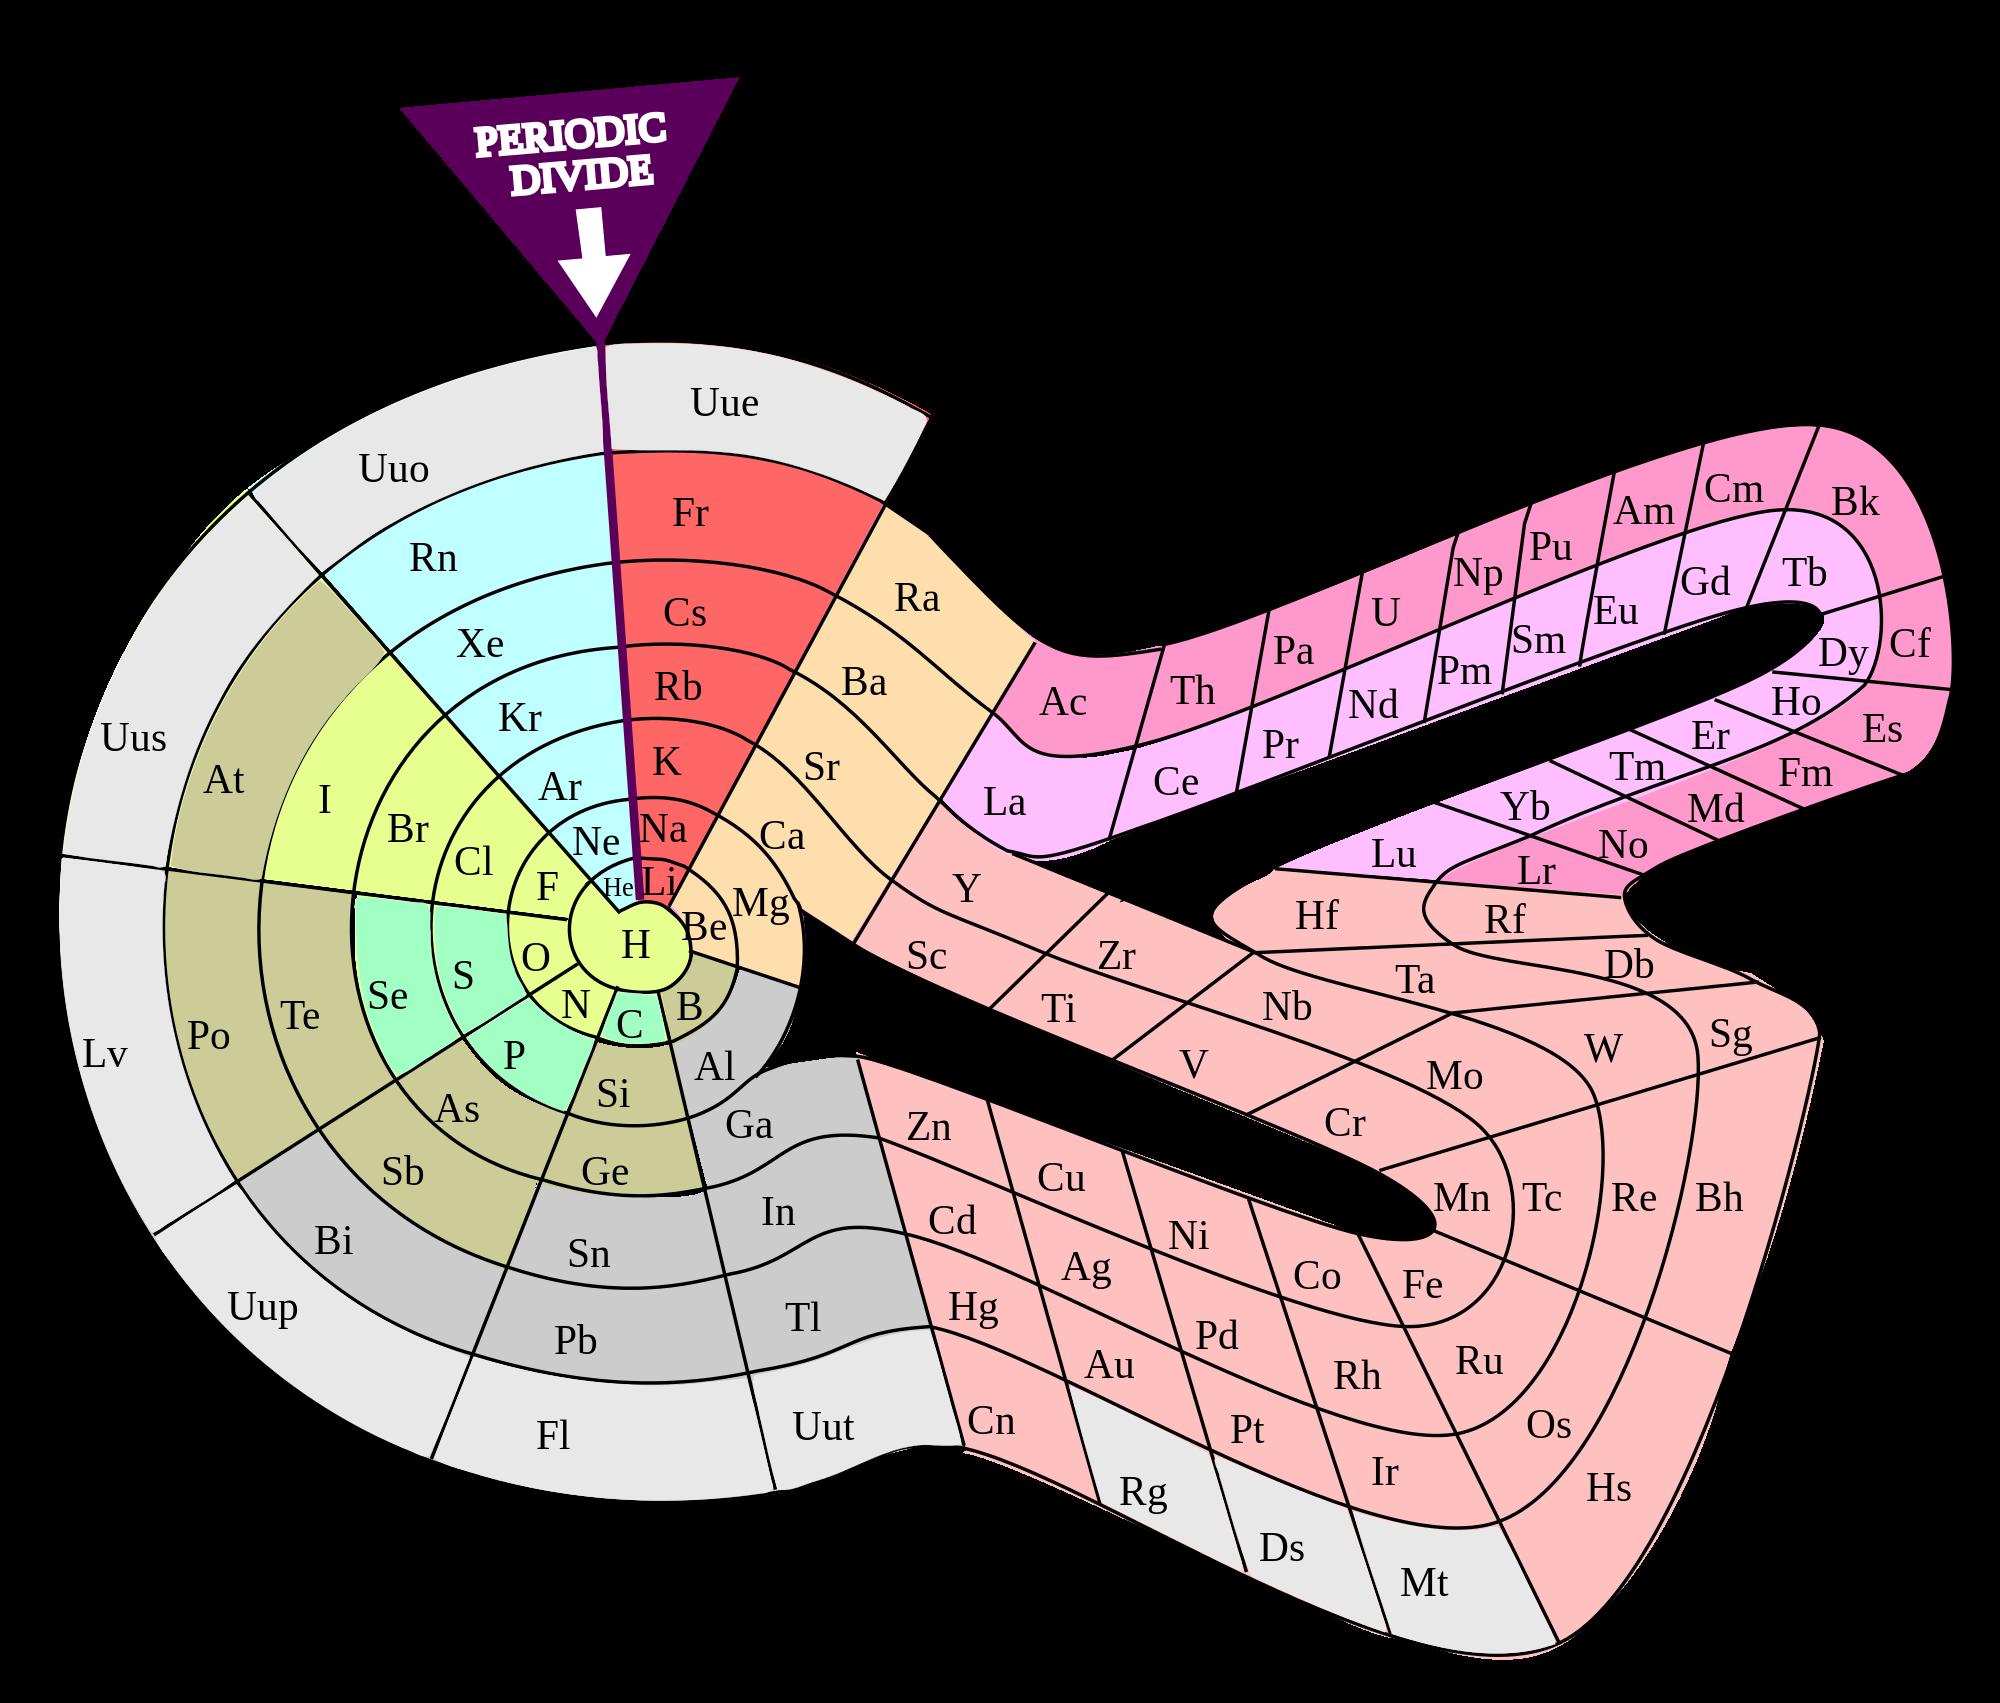 Alternative periodic tables wikipedia the free encyclopedia alternative periodic tables wikipedia the free encyclopedia urtaz Image collections